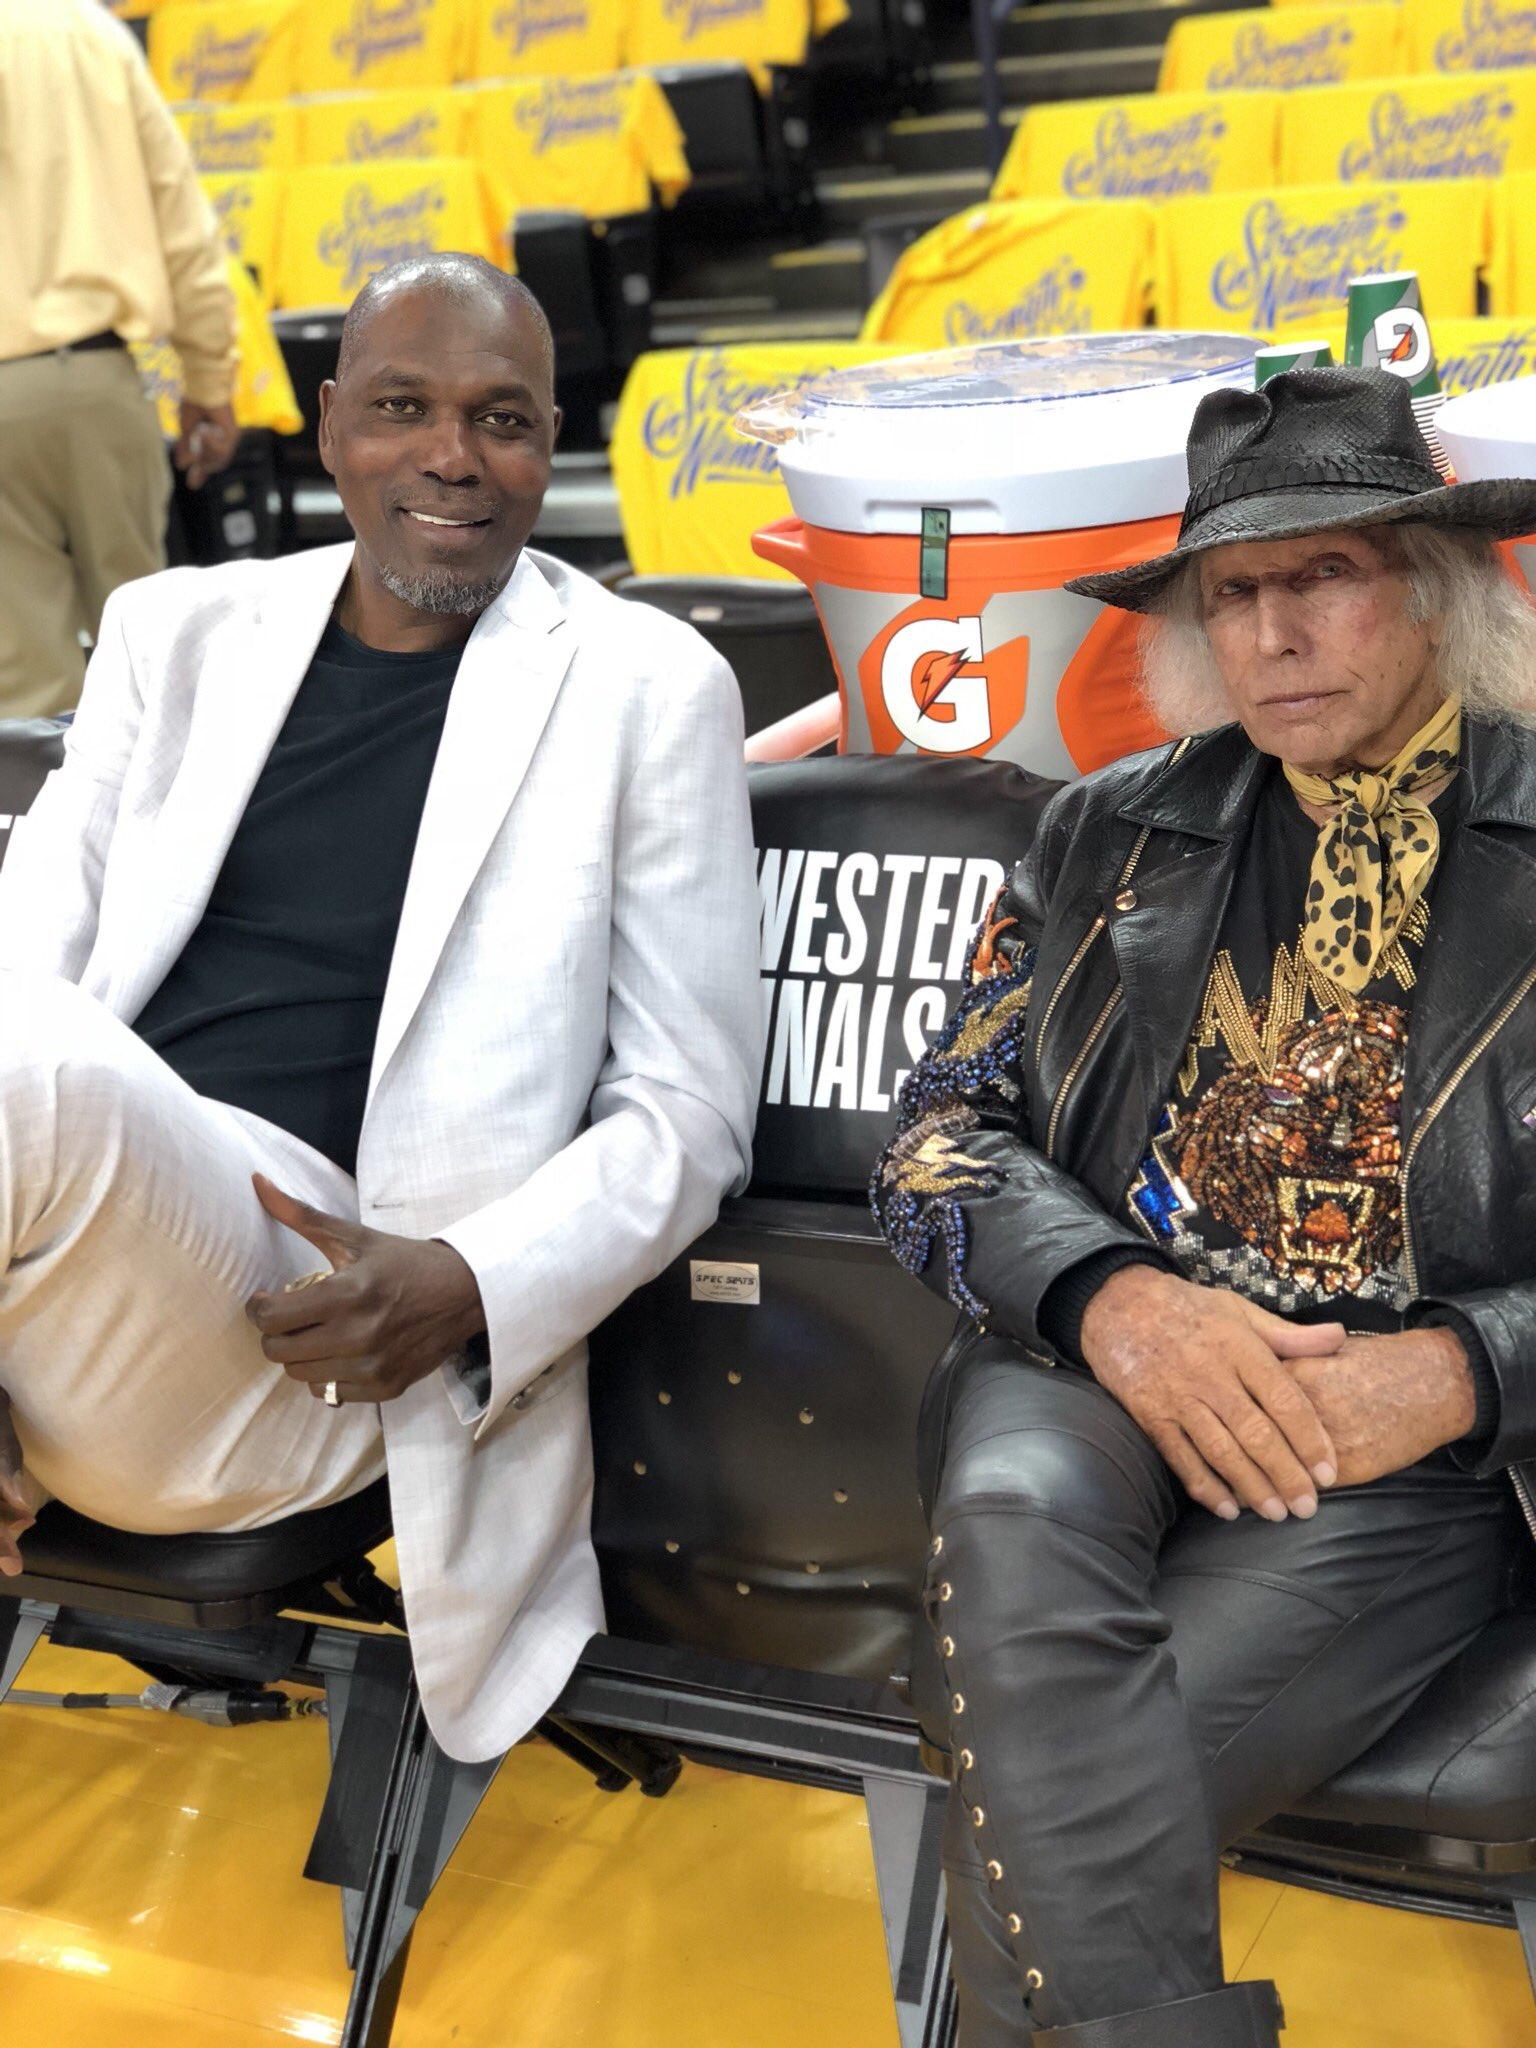 Game 4.  @DR34M x @jamesfgoldstein. #NBACelebRow https://t.co/9Yb7lzCSgv